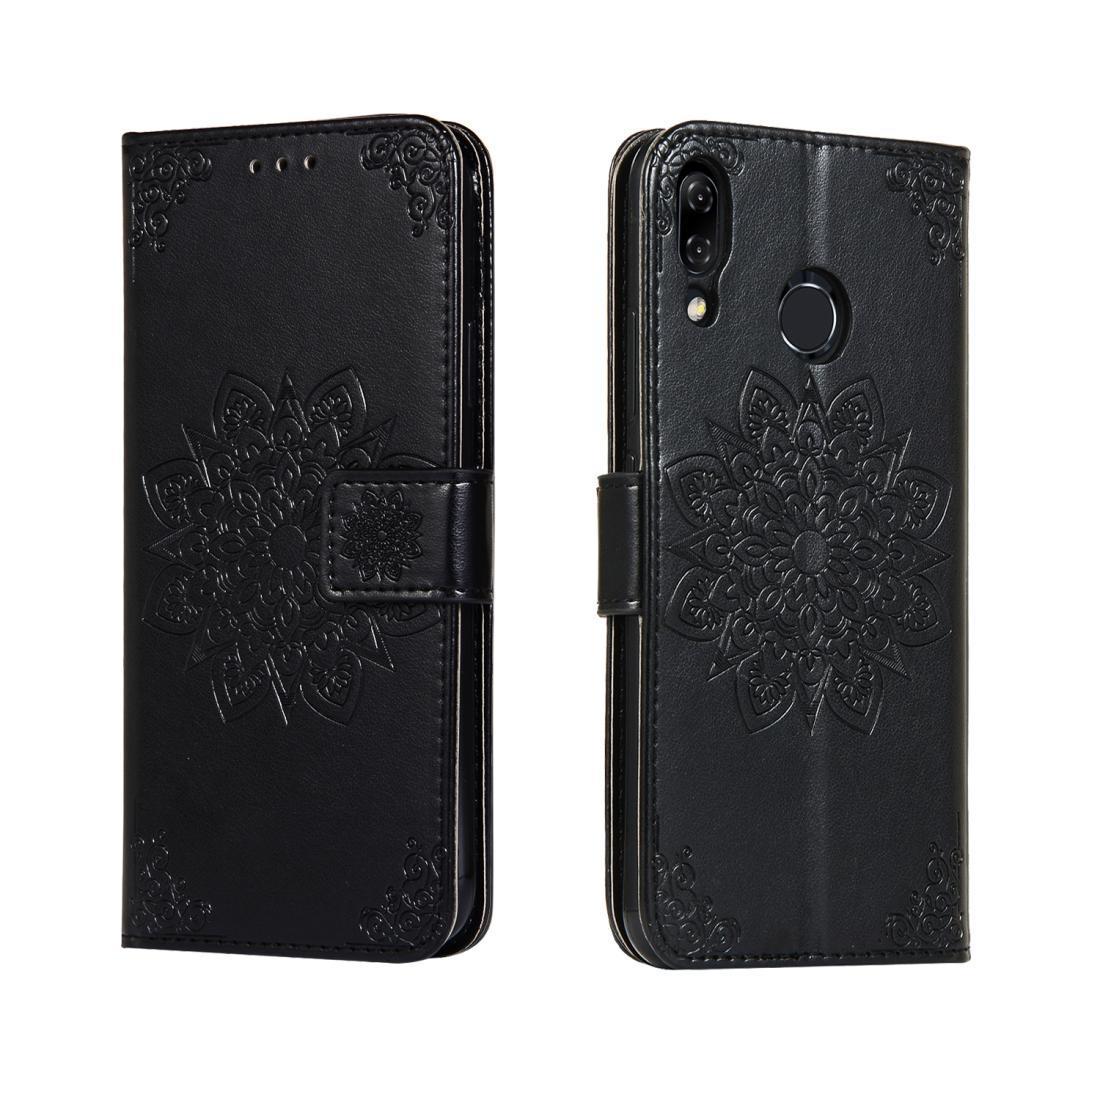 For ASUS Zenfone 5 ZE620KL Embossed Kaleidoscope Flower Horizontal Flip Leather Case with Holder & Card Slots & Wallet